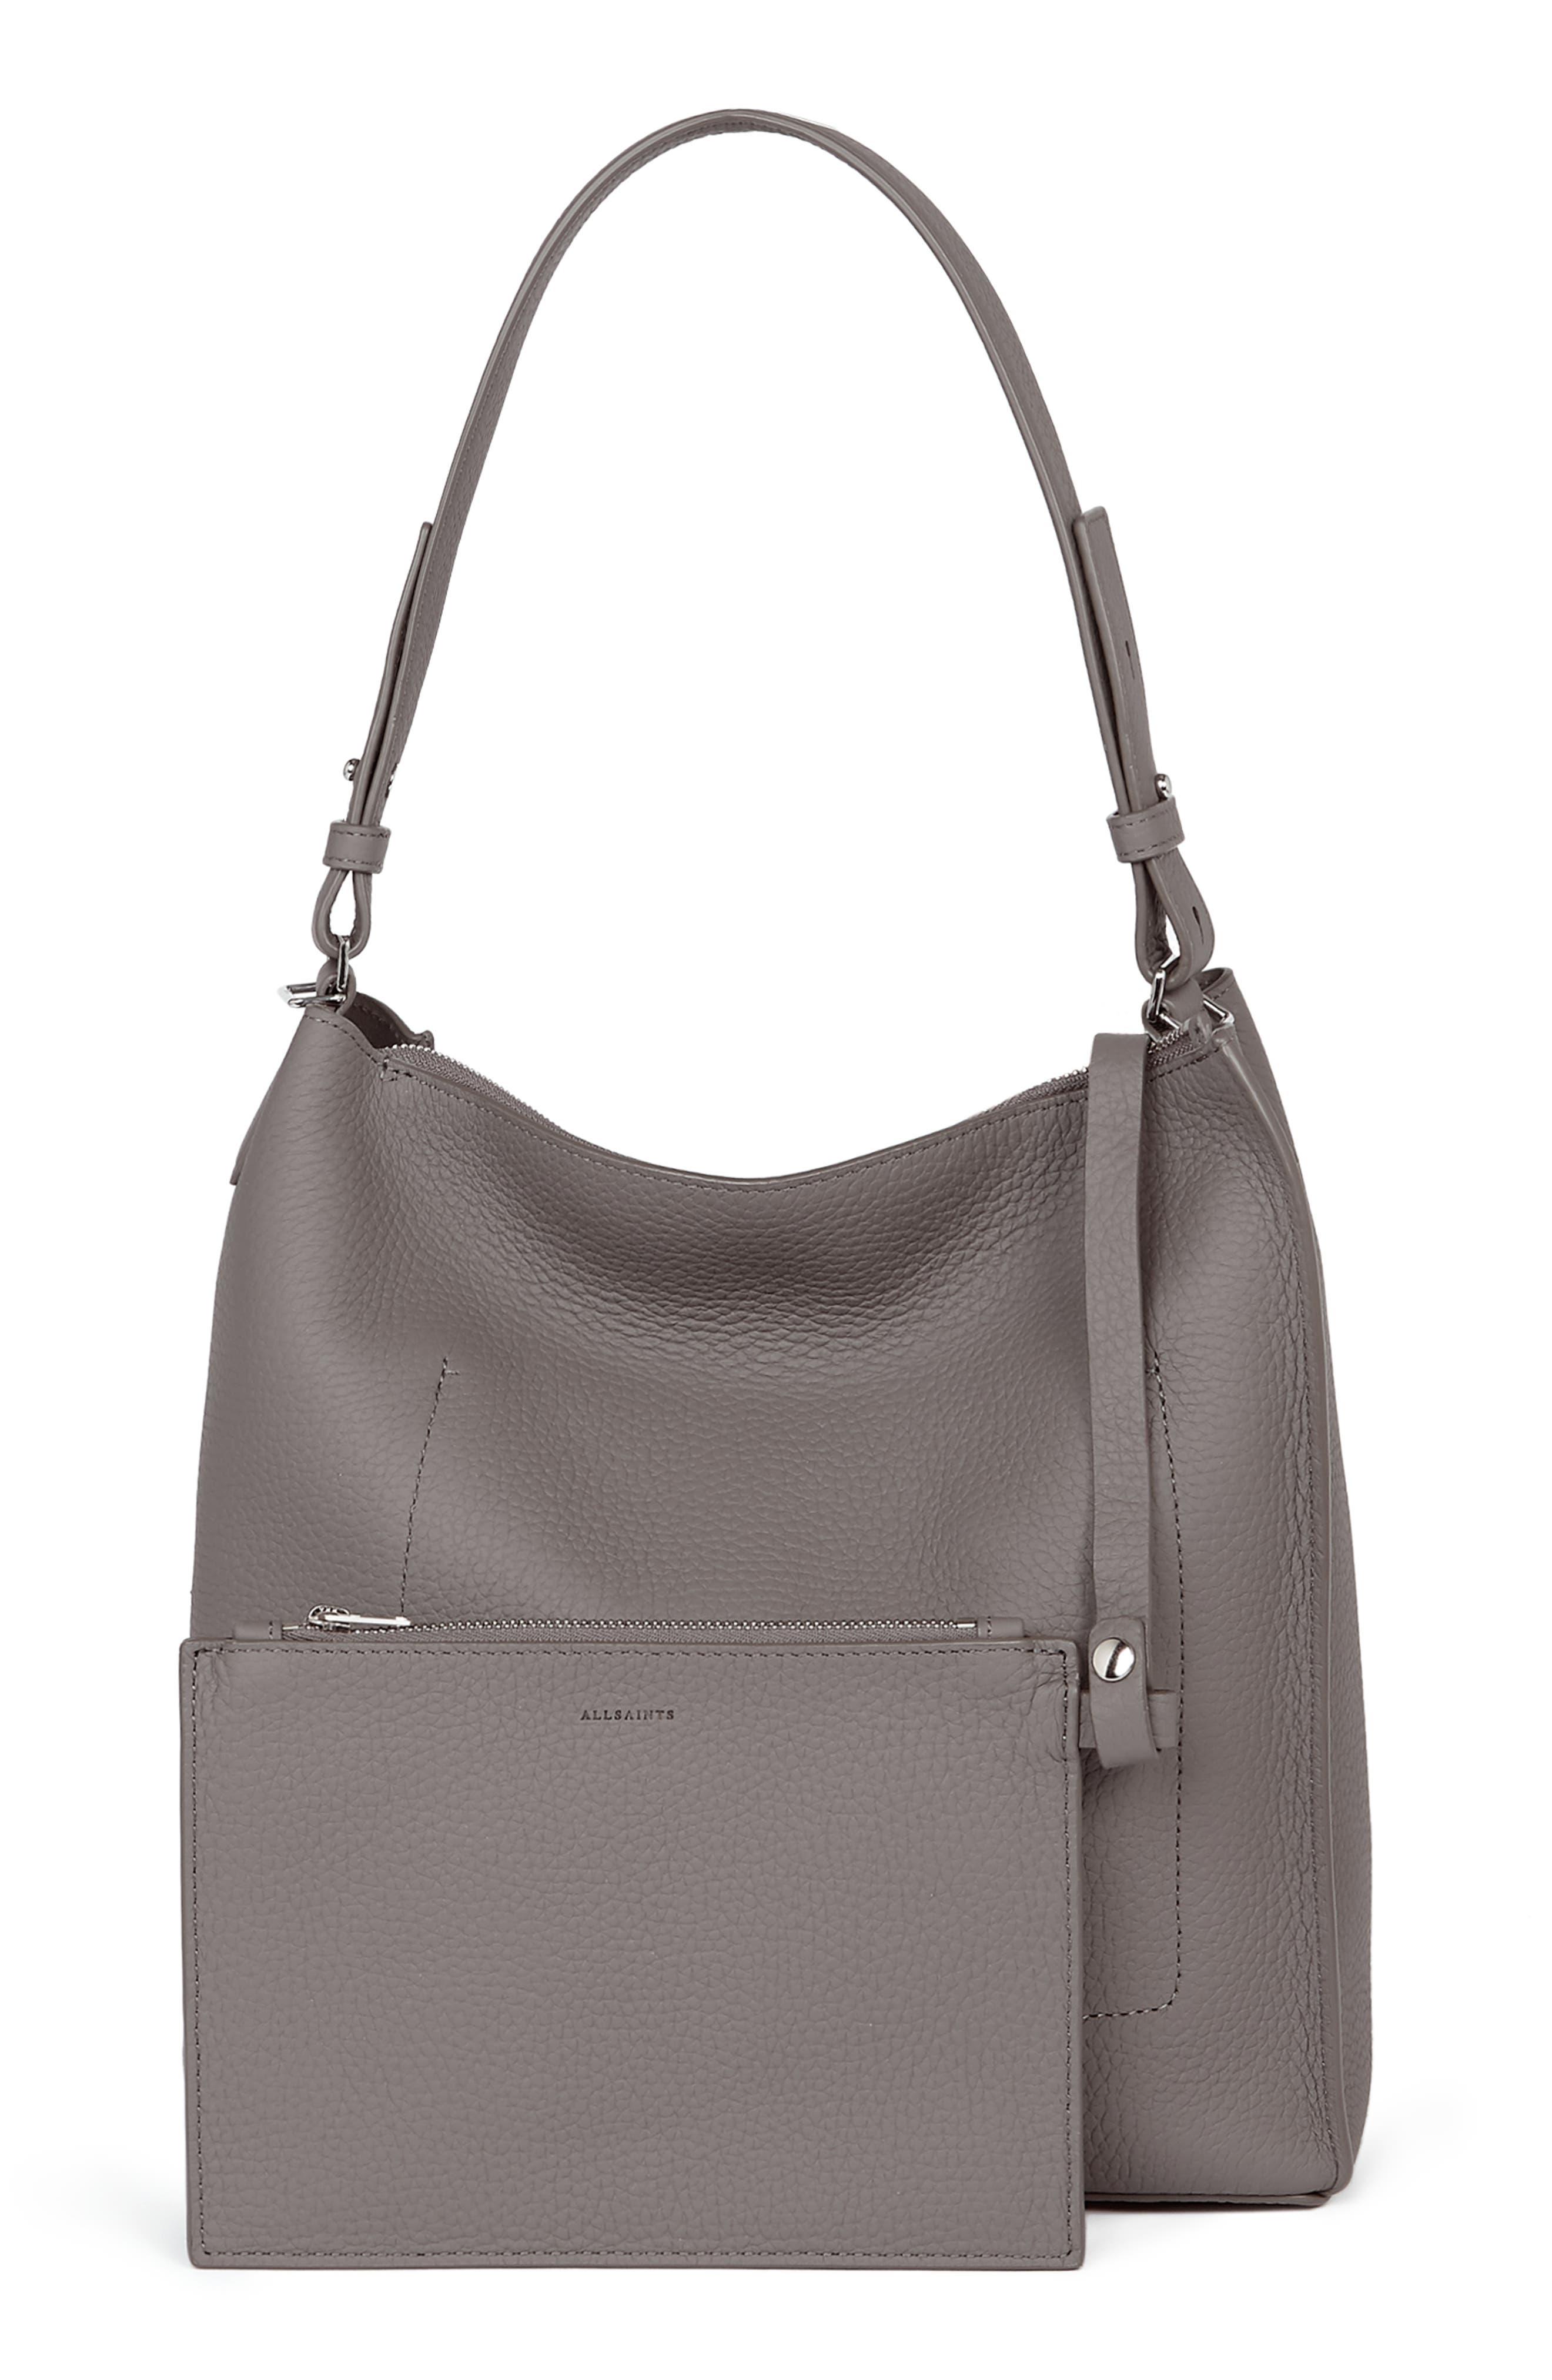 ALLSAINTS, 'Kita' Leather Shoulder/Crossbody Bag, Alternate thumbnail 2, color, STORM GREY